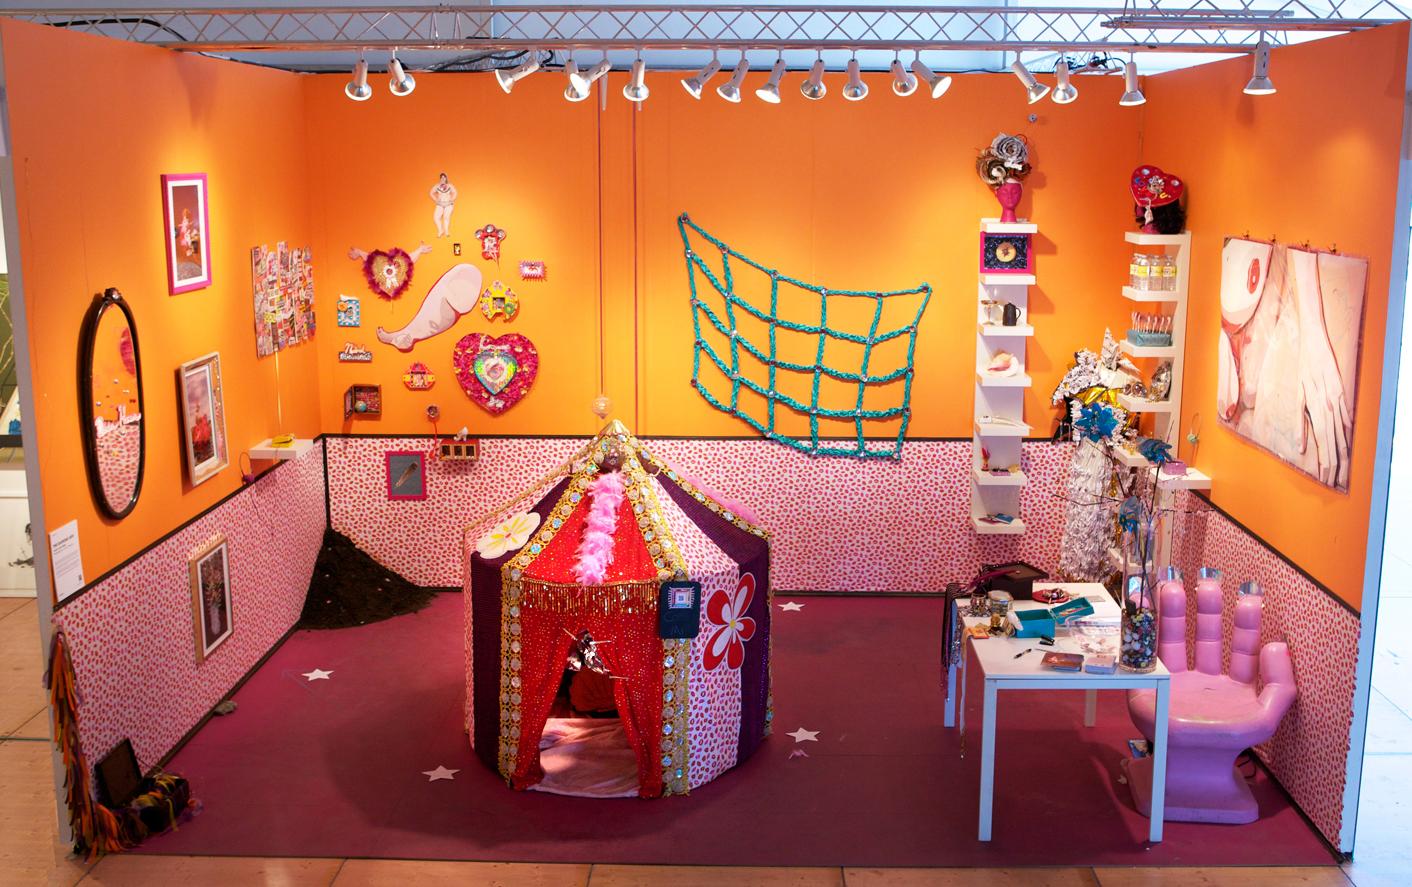 The Diamond Den NY' @ SCOPE Art Fair